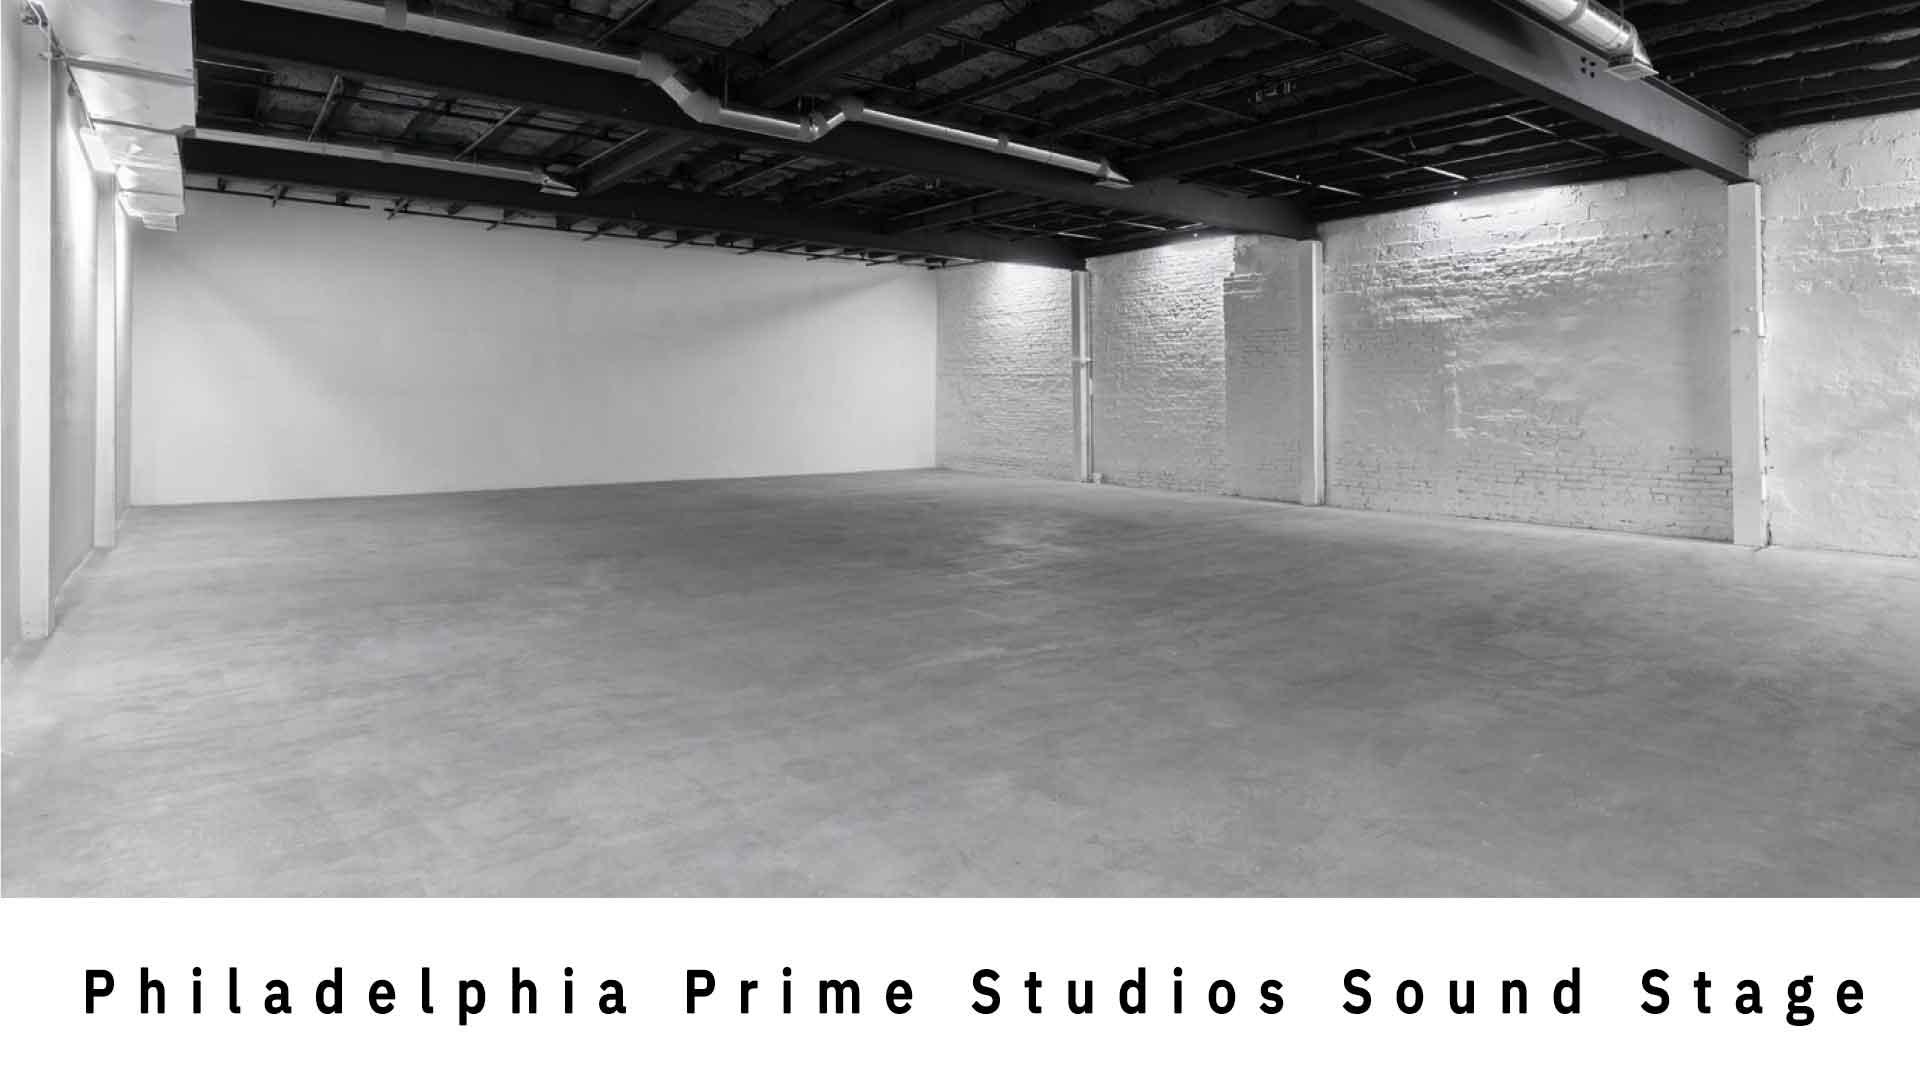 Philadelphia Prime Studios Sound Stage